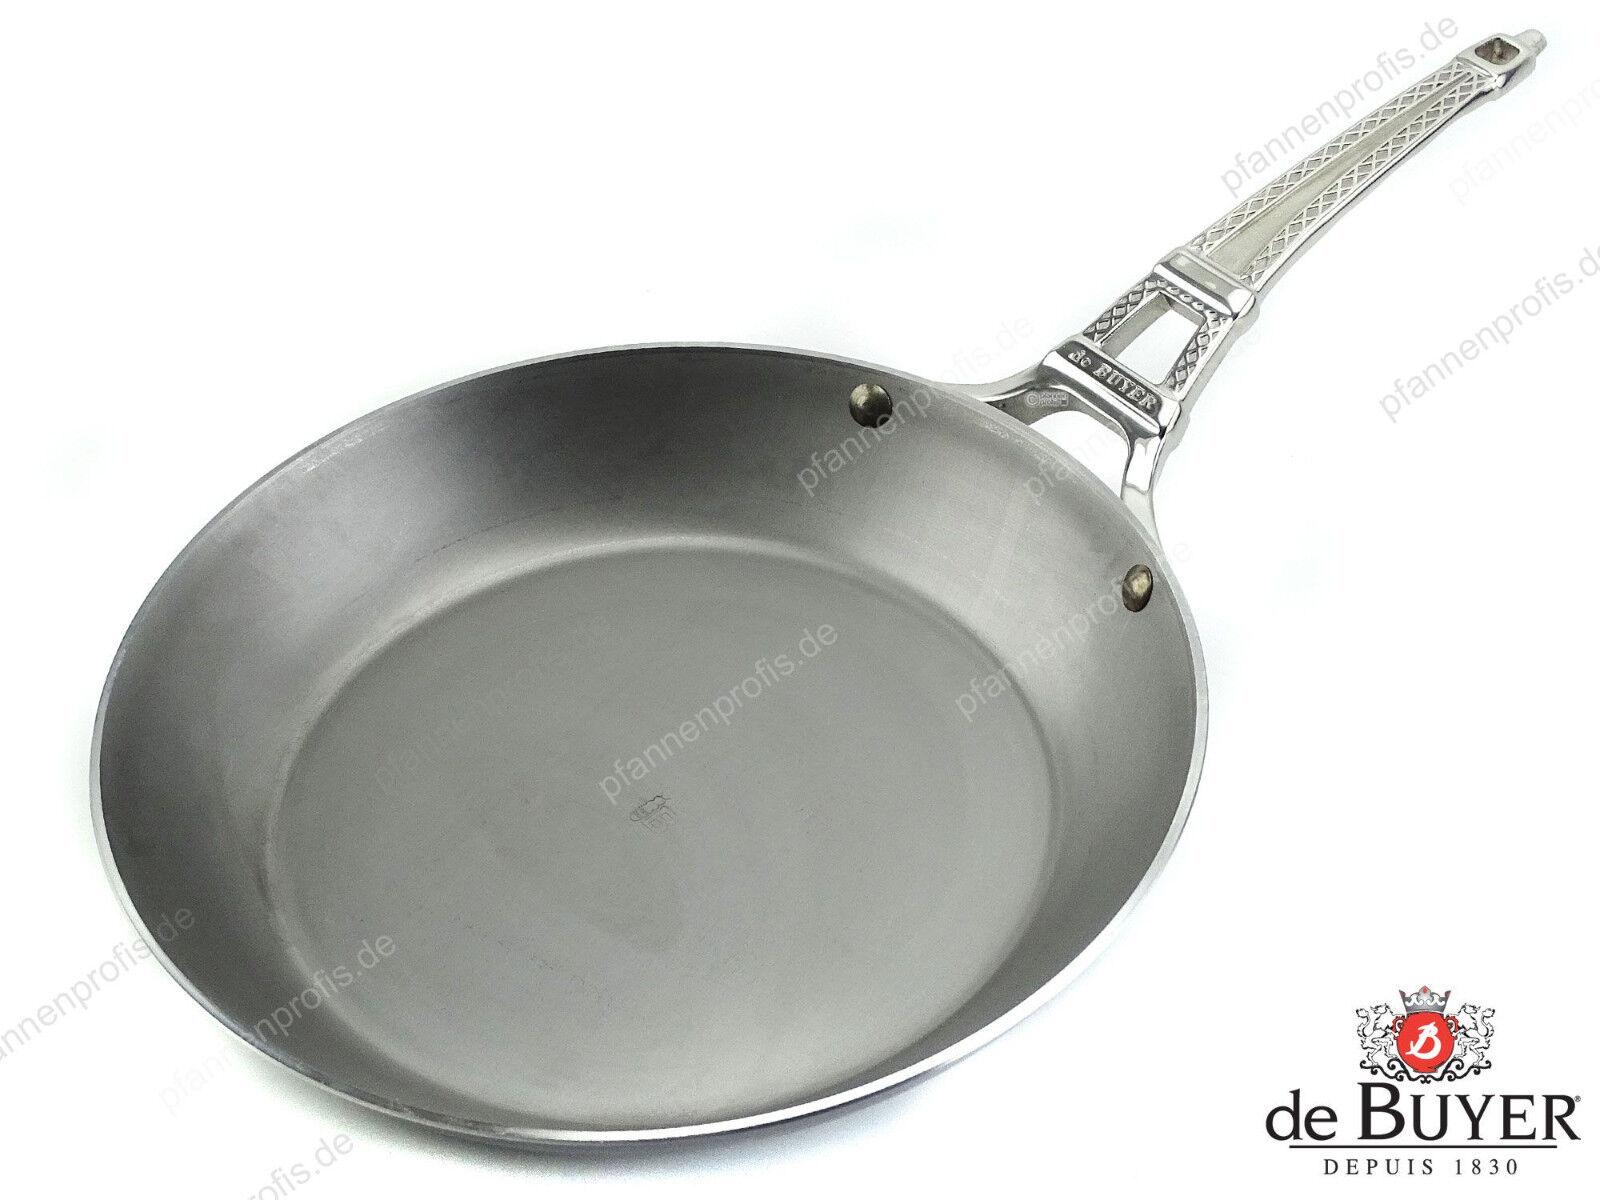 DE BUYER BUYER BUYER Eisenpfanne FRENCH COLLECTION MINERAL B 28 cm | Shop  a83d6a